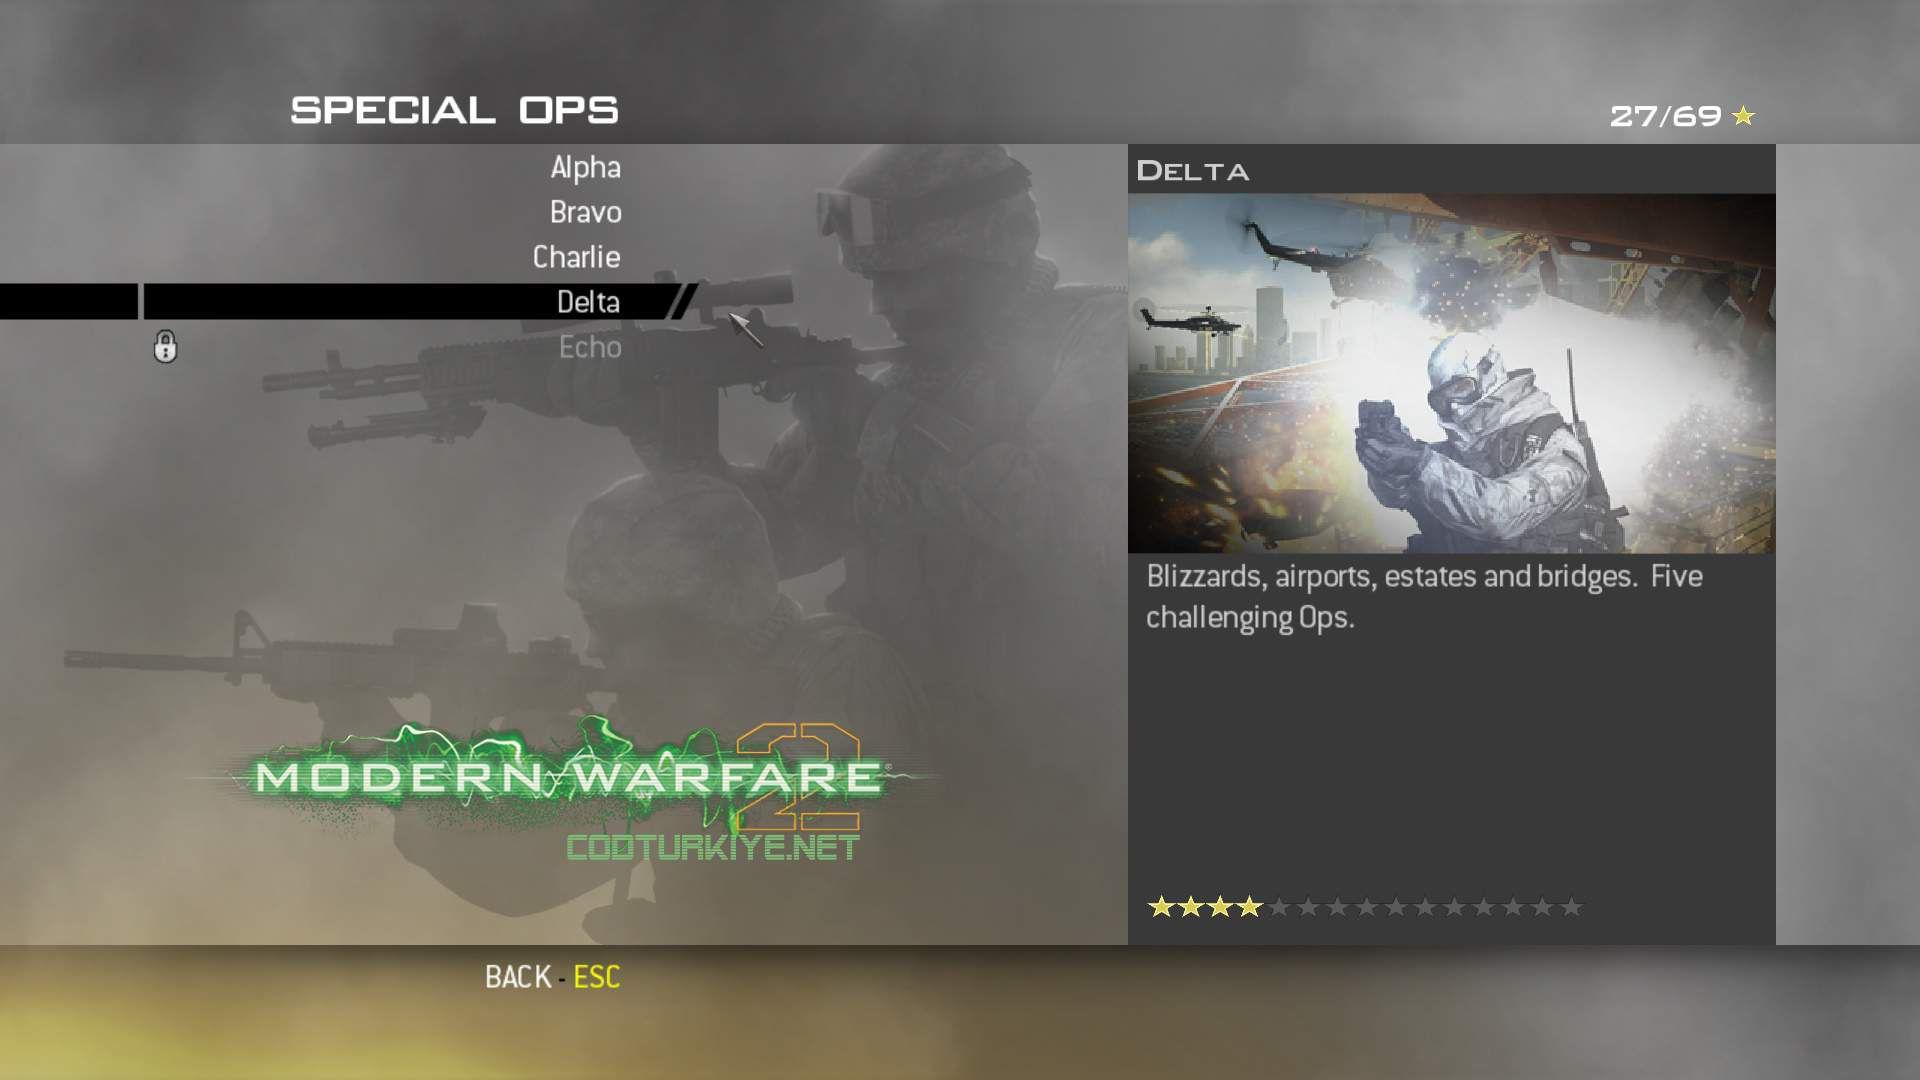 Call of Duty Modern Warfare 2 Special Ops Delta Görevleri